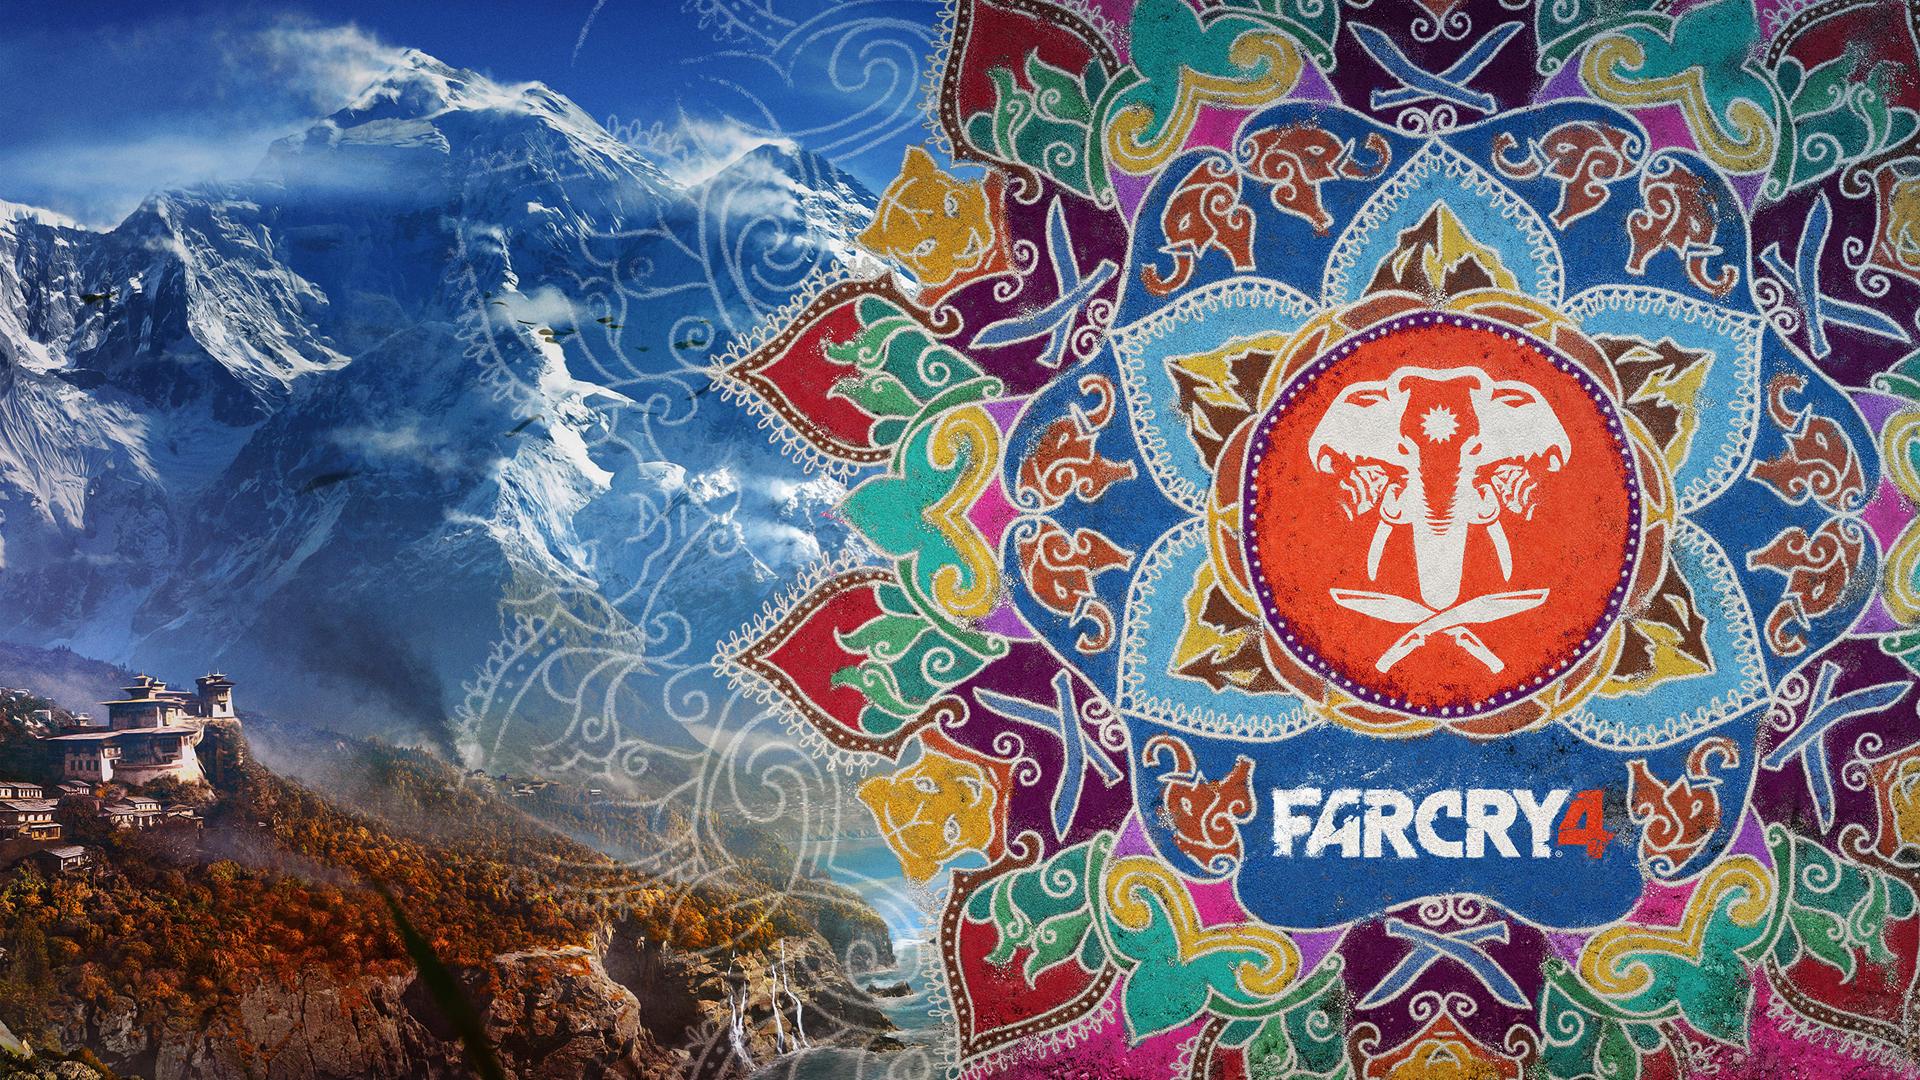 Far Cry 4 Wallpaper 1920x1080